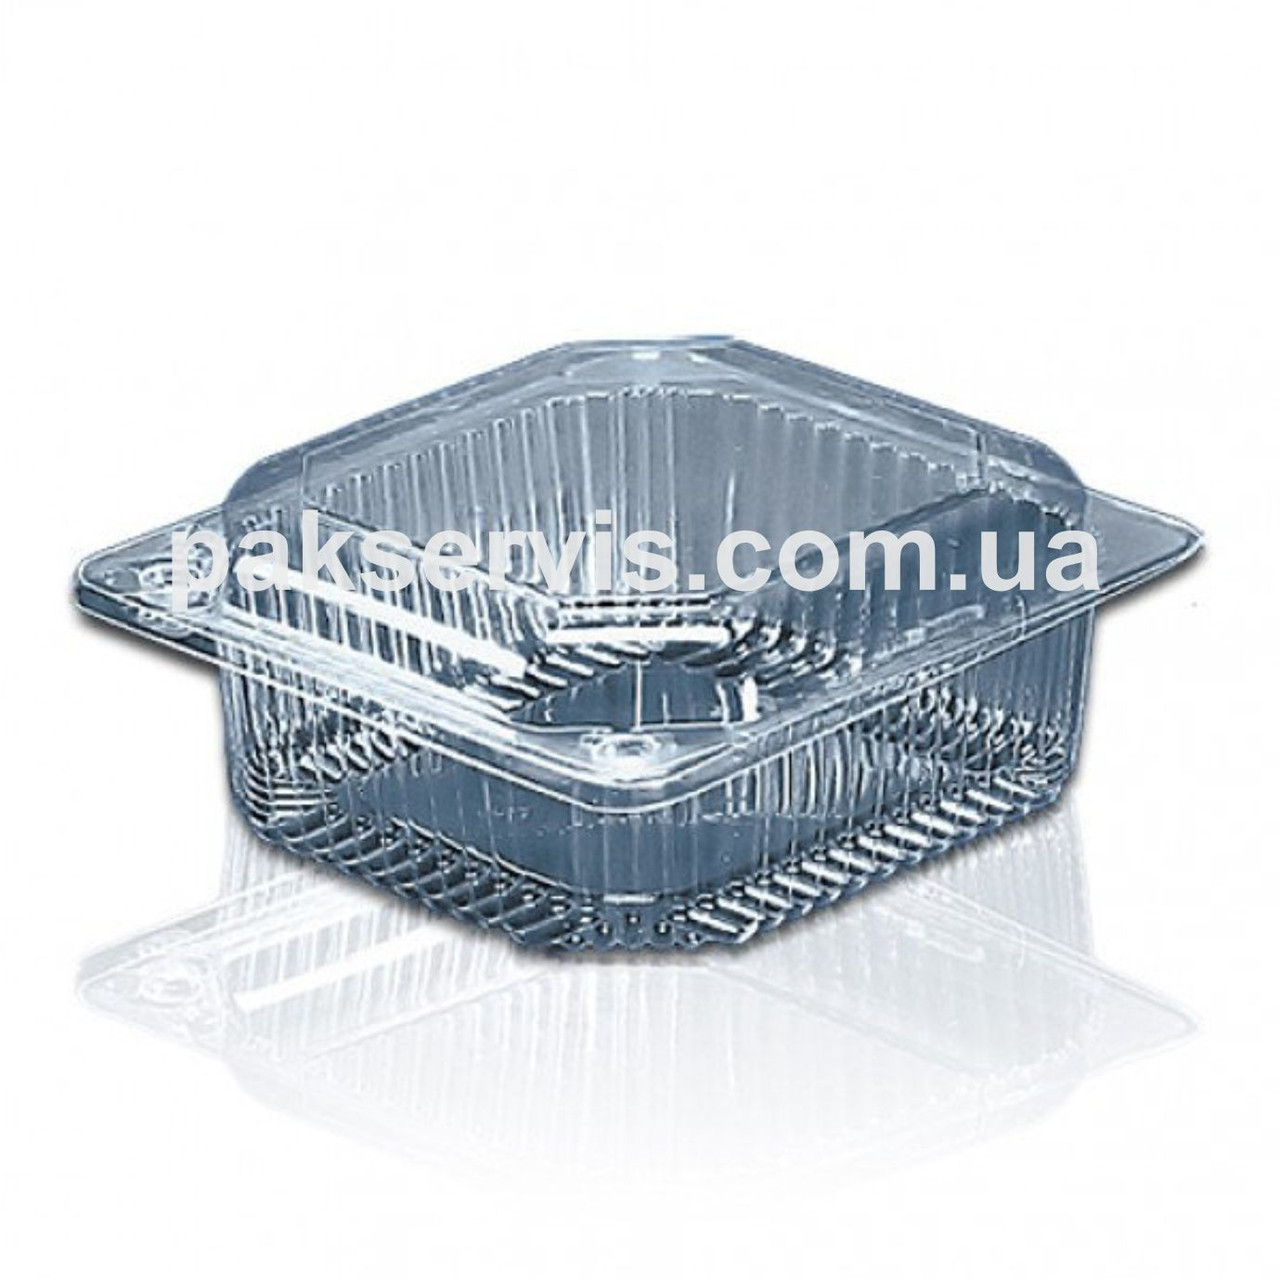 Упаковка ПС-9 (750мл) 1/500